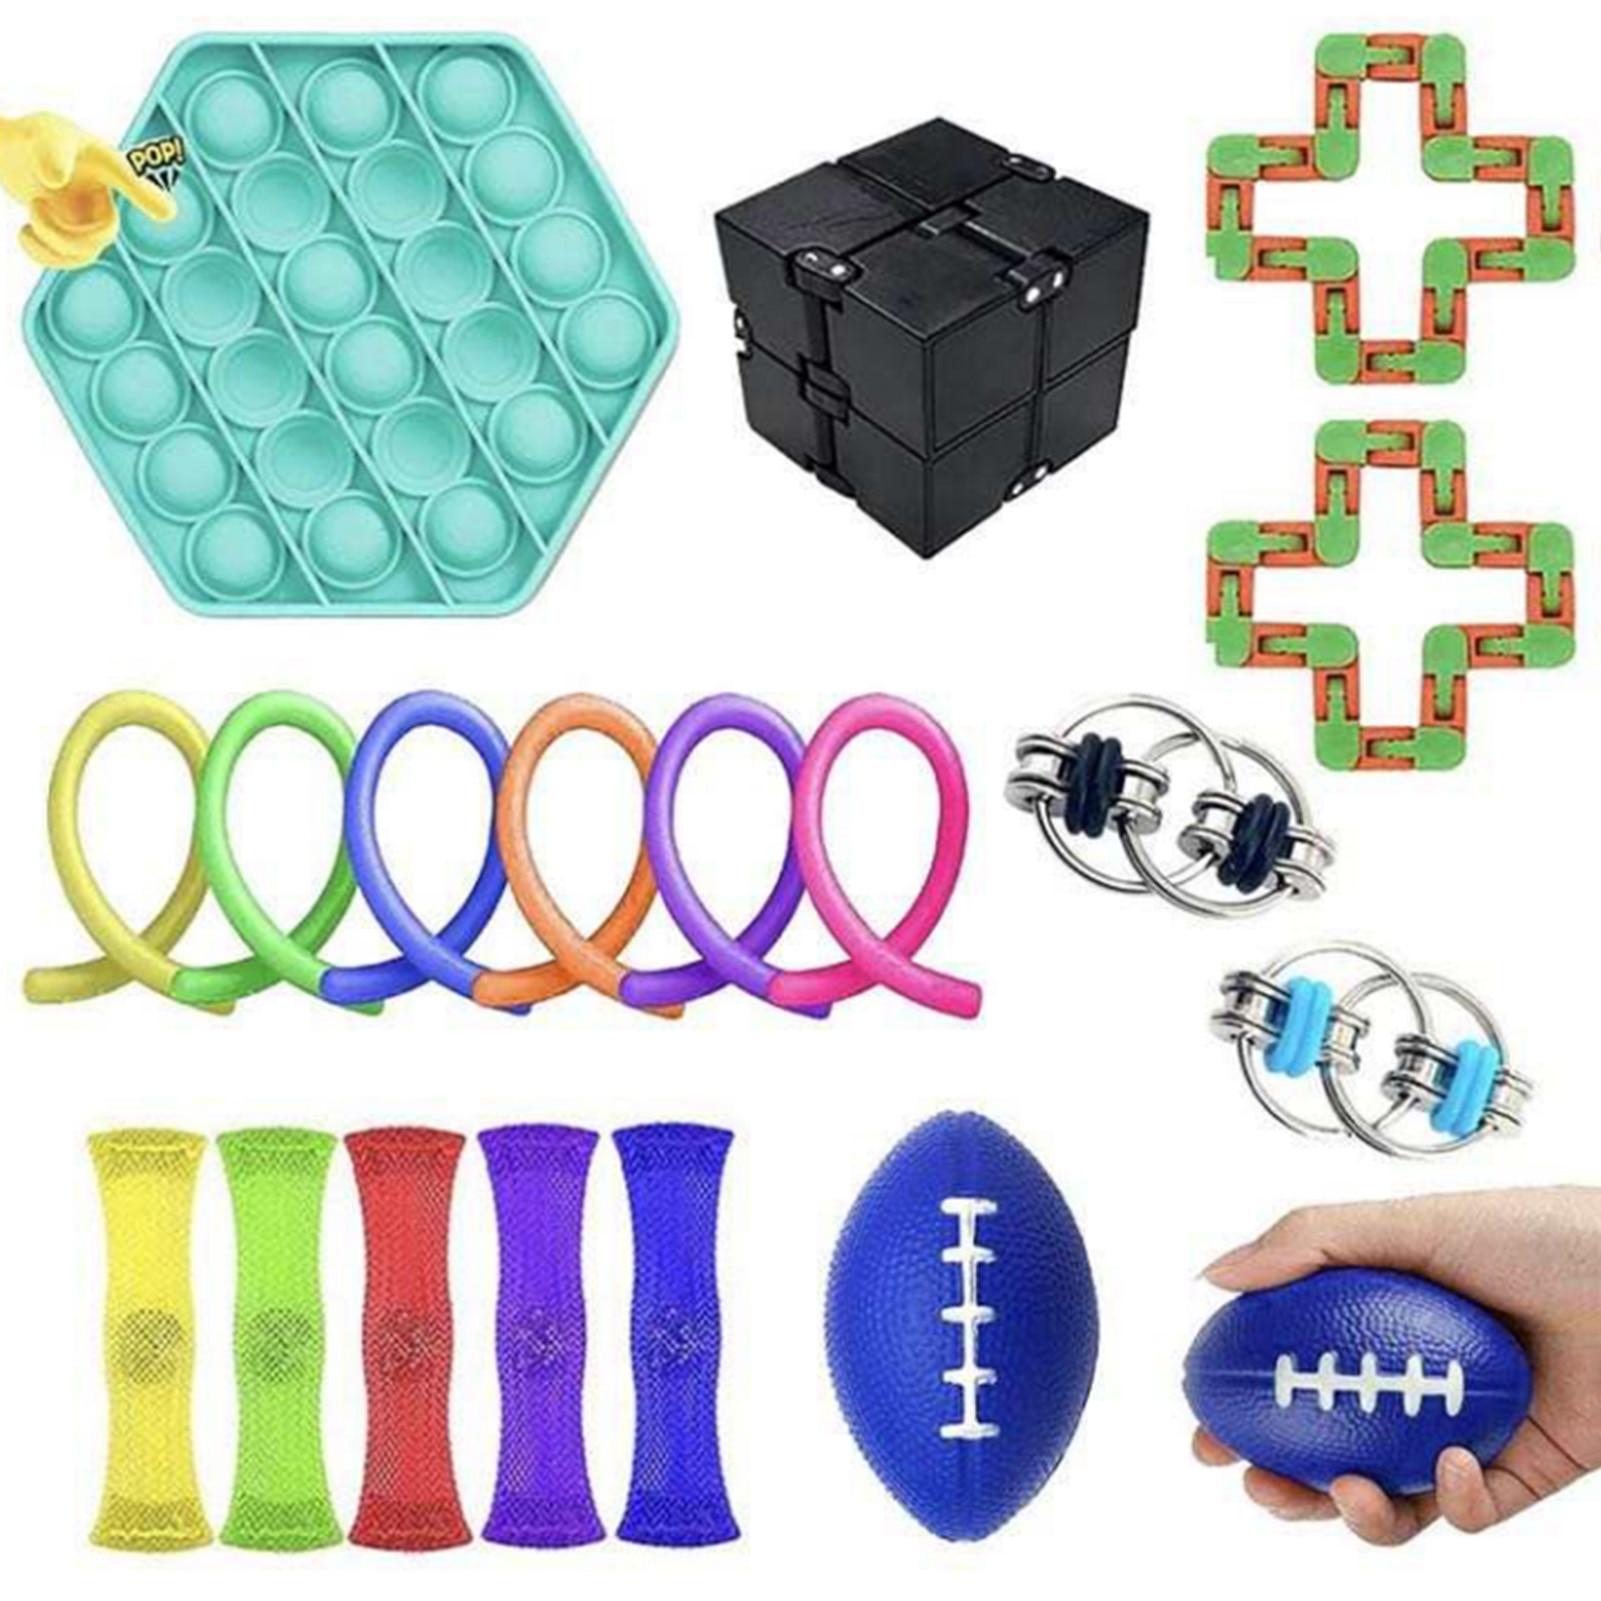 19PCS Fidget Sensory Bubble Toys Set Safe Stress Relief Toy Set Antistress Relief Autism Anxiety Relief Stress Bubble Toys enlarge